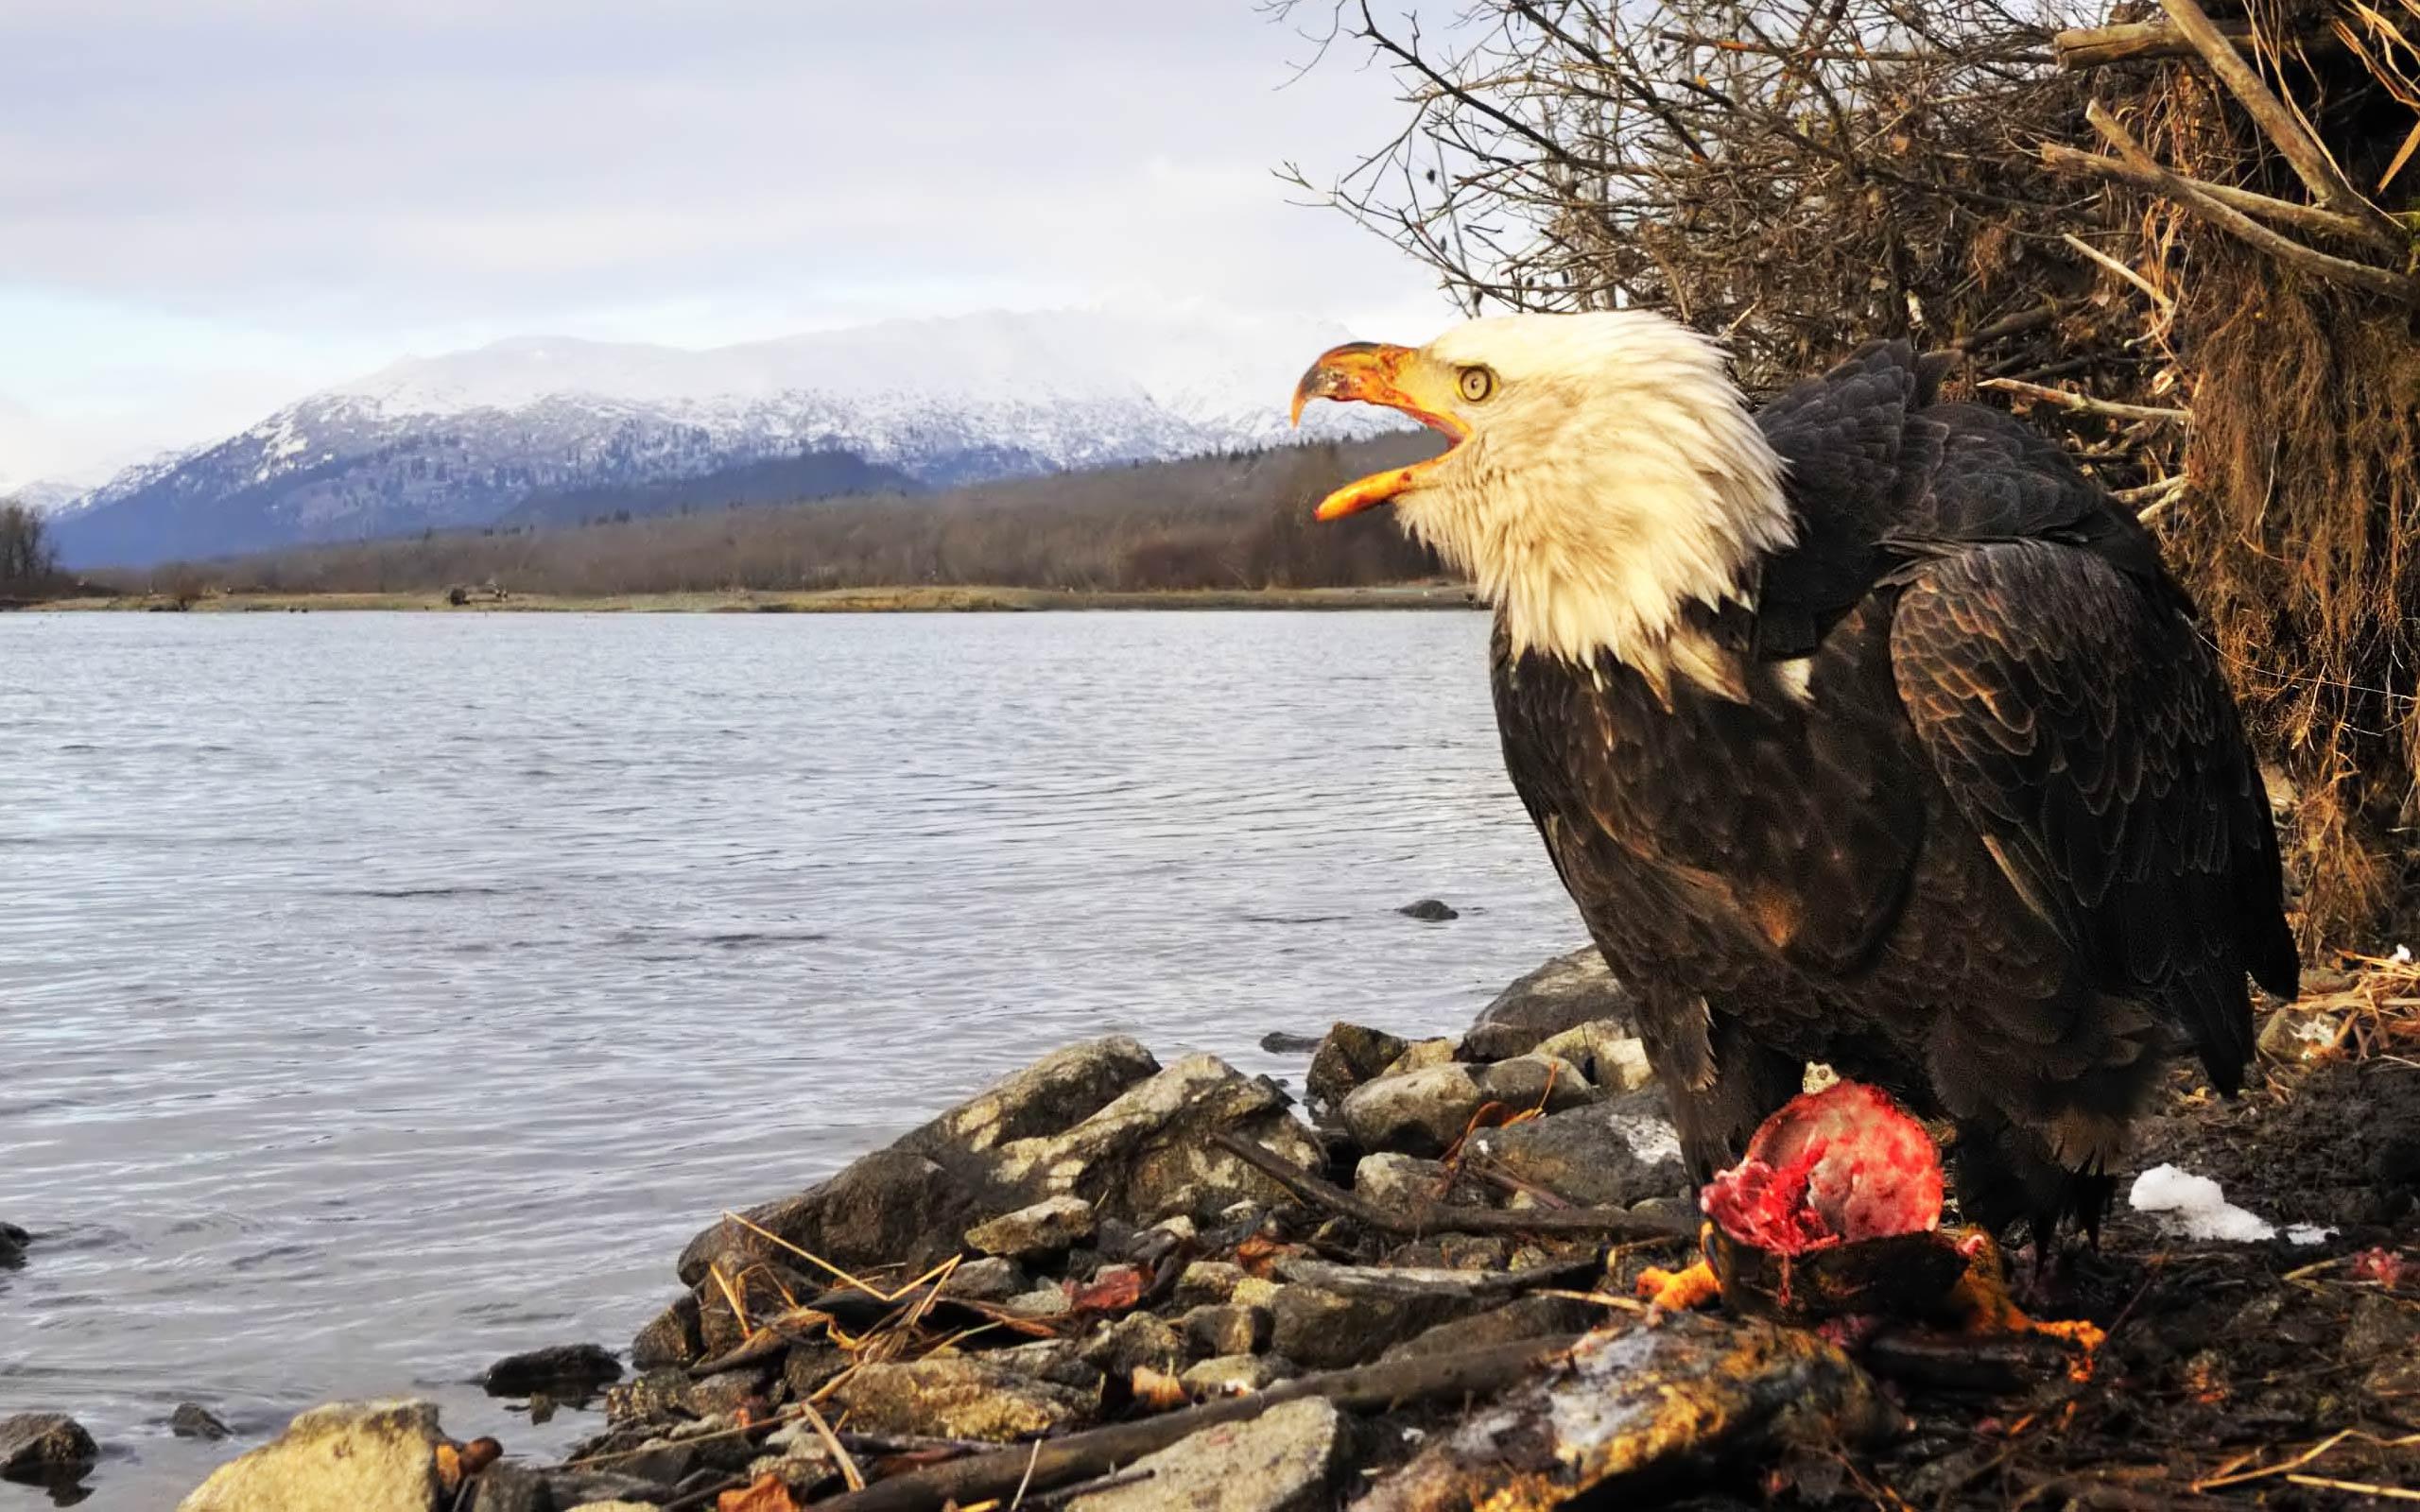 720x1280 - Animal/Bald Eagle - Wallpaper ID: 184806